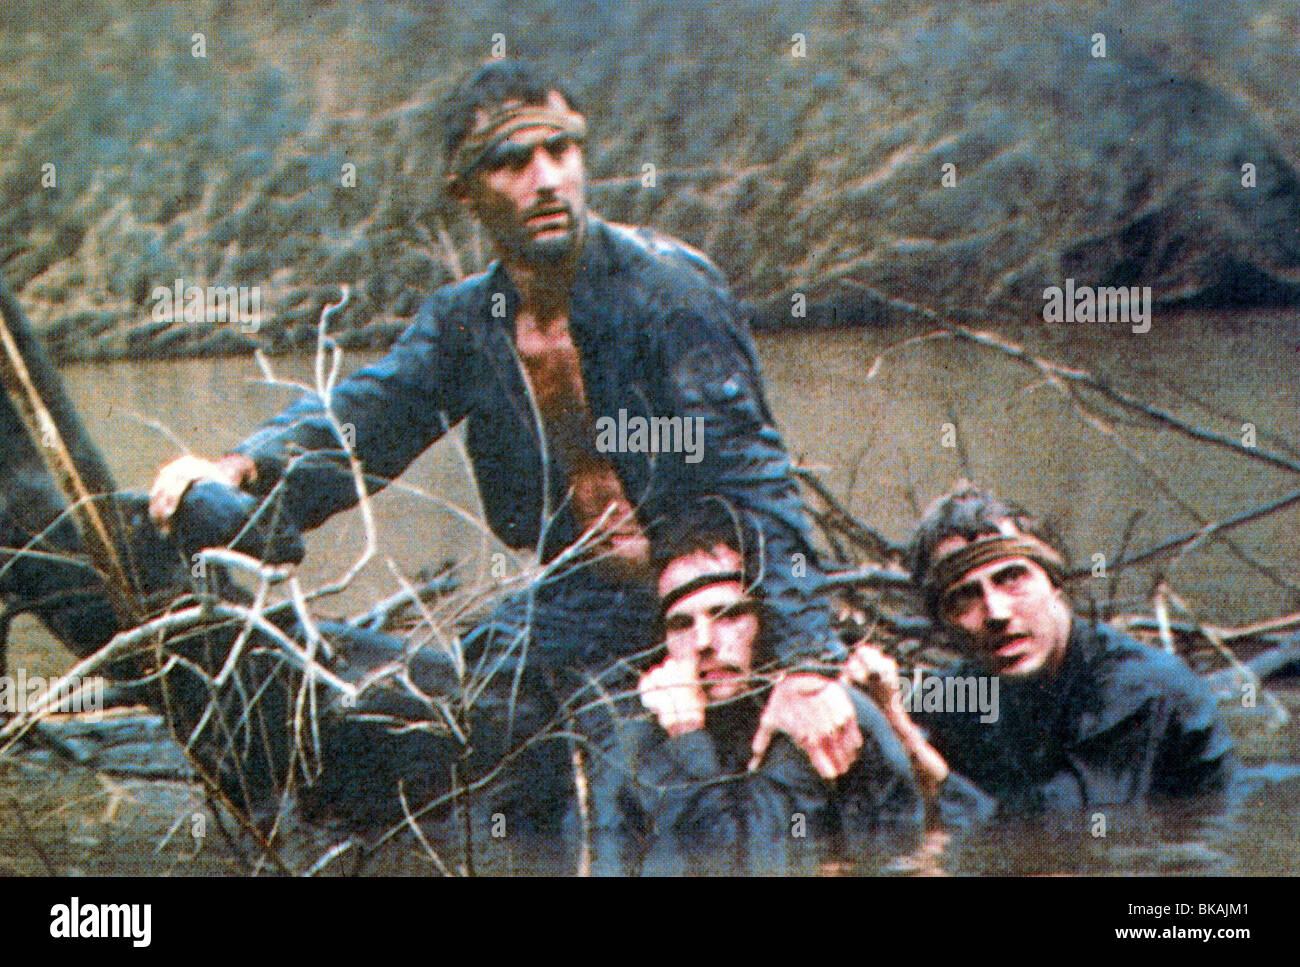 the deer hunter 1978 robert de niro john savage christopher